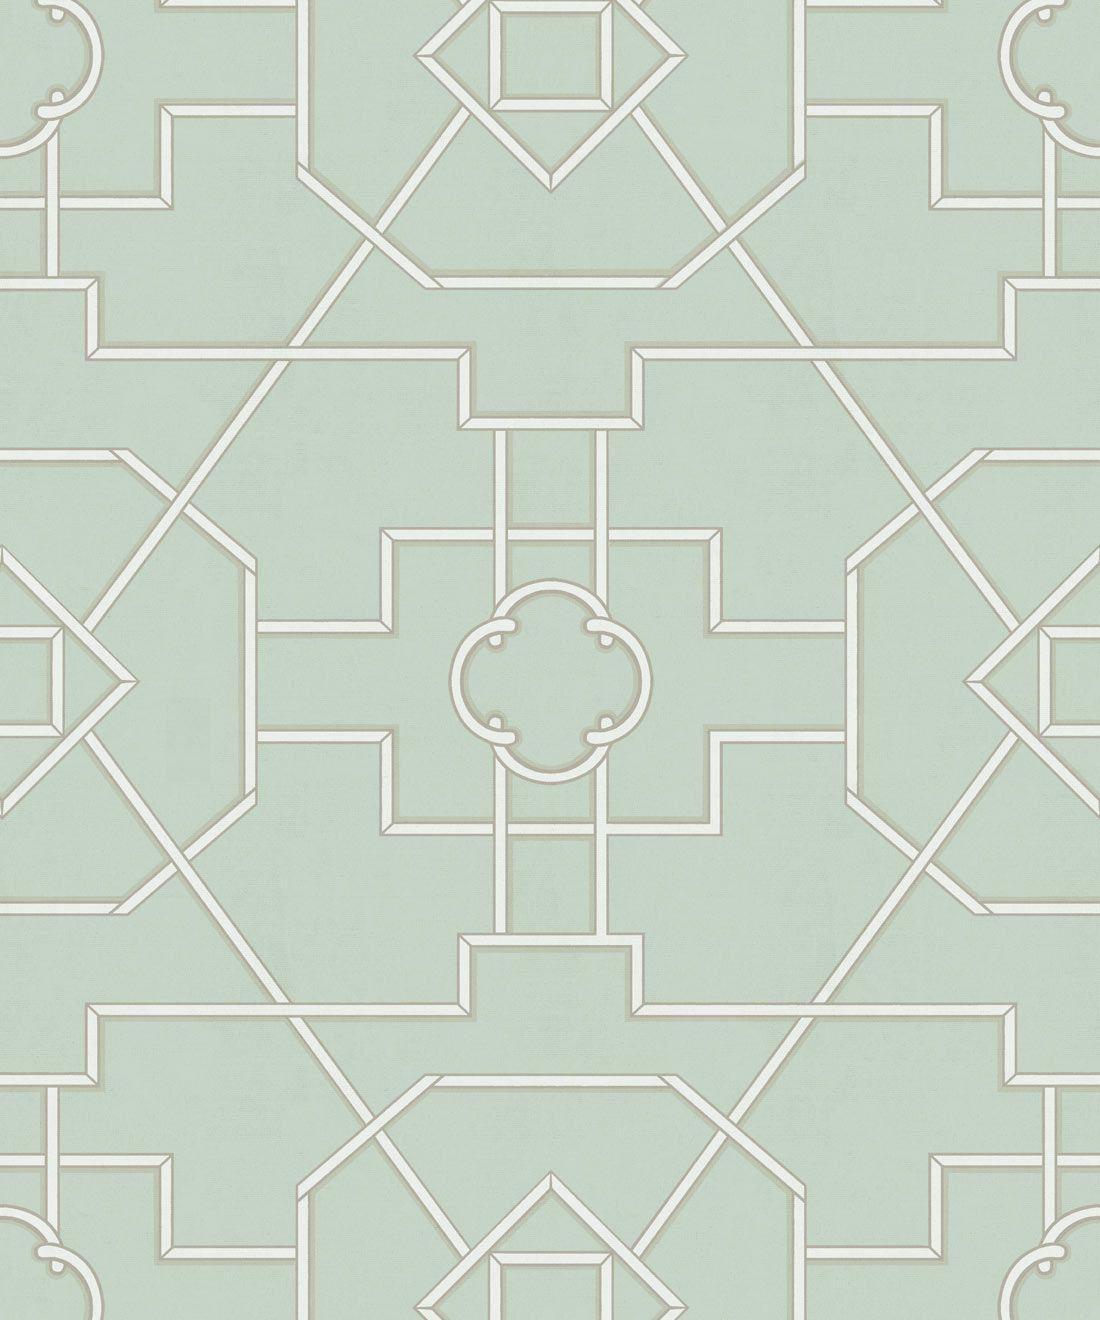 Trellis Wallpaper • Geometric Wallpaper • Mint Green Wallpaper • Swatch